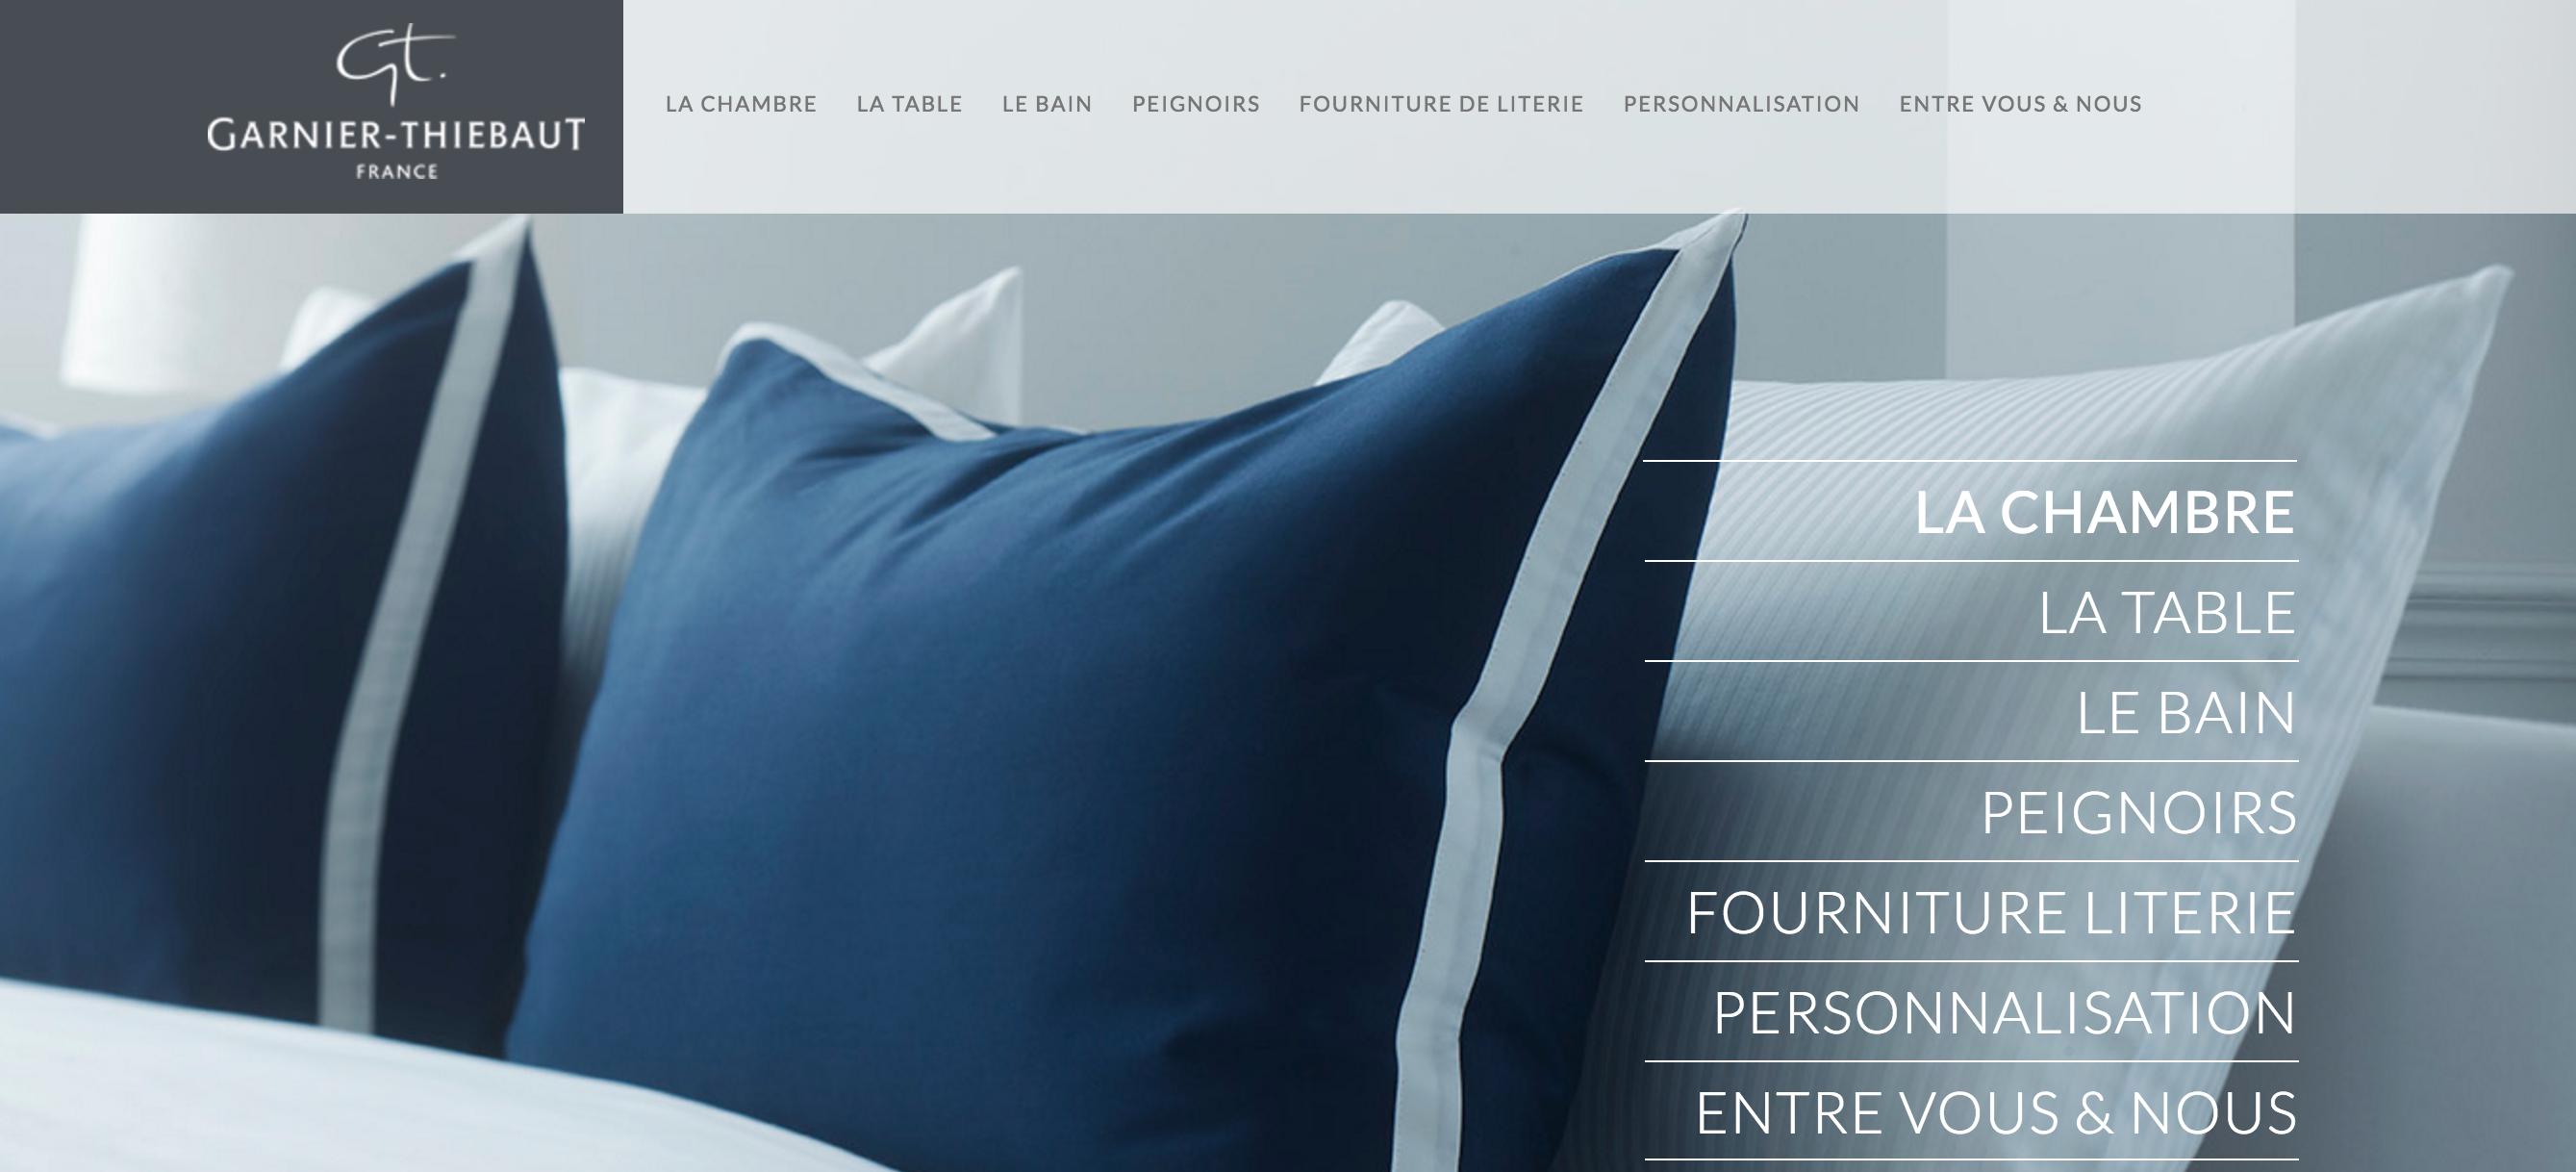 recherche emploi femme de chambre geneve. Black Bedroom Furniture Sets. Home Design Ideas